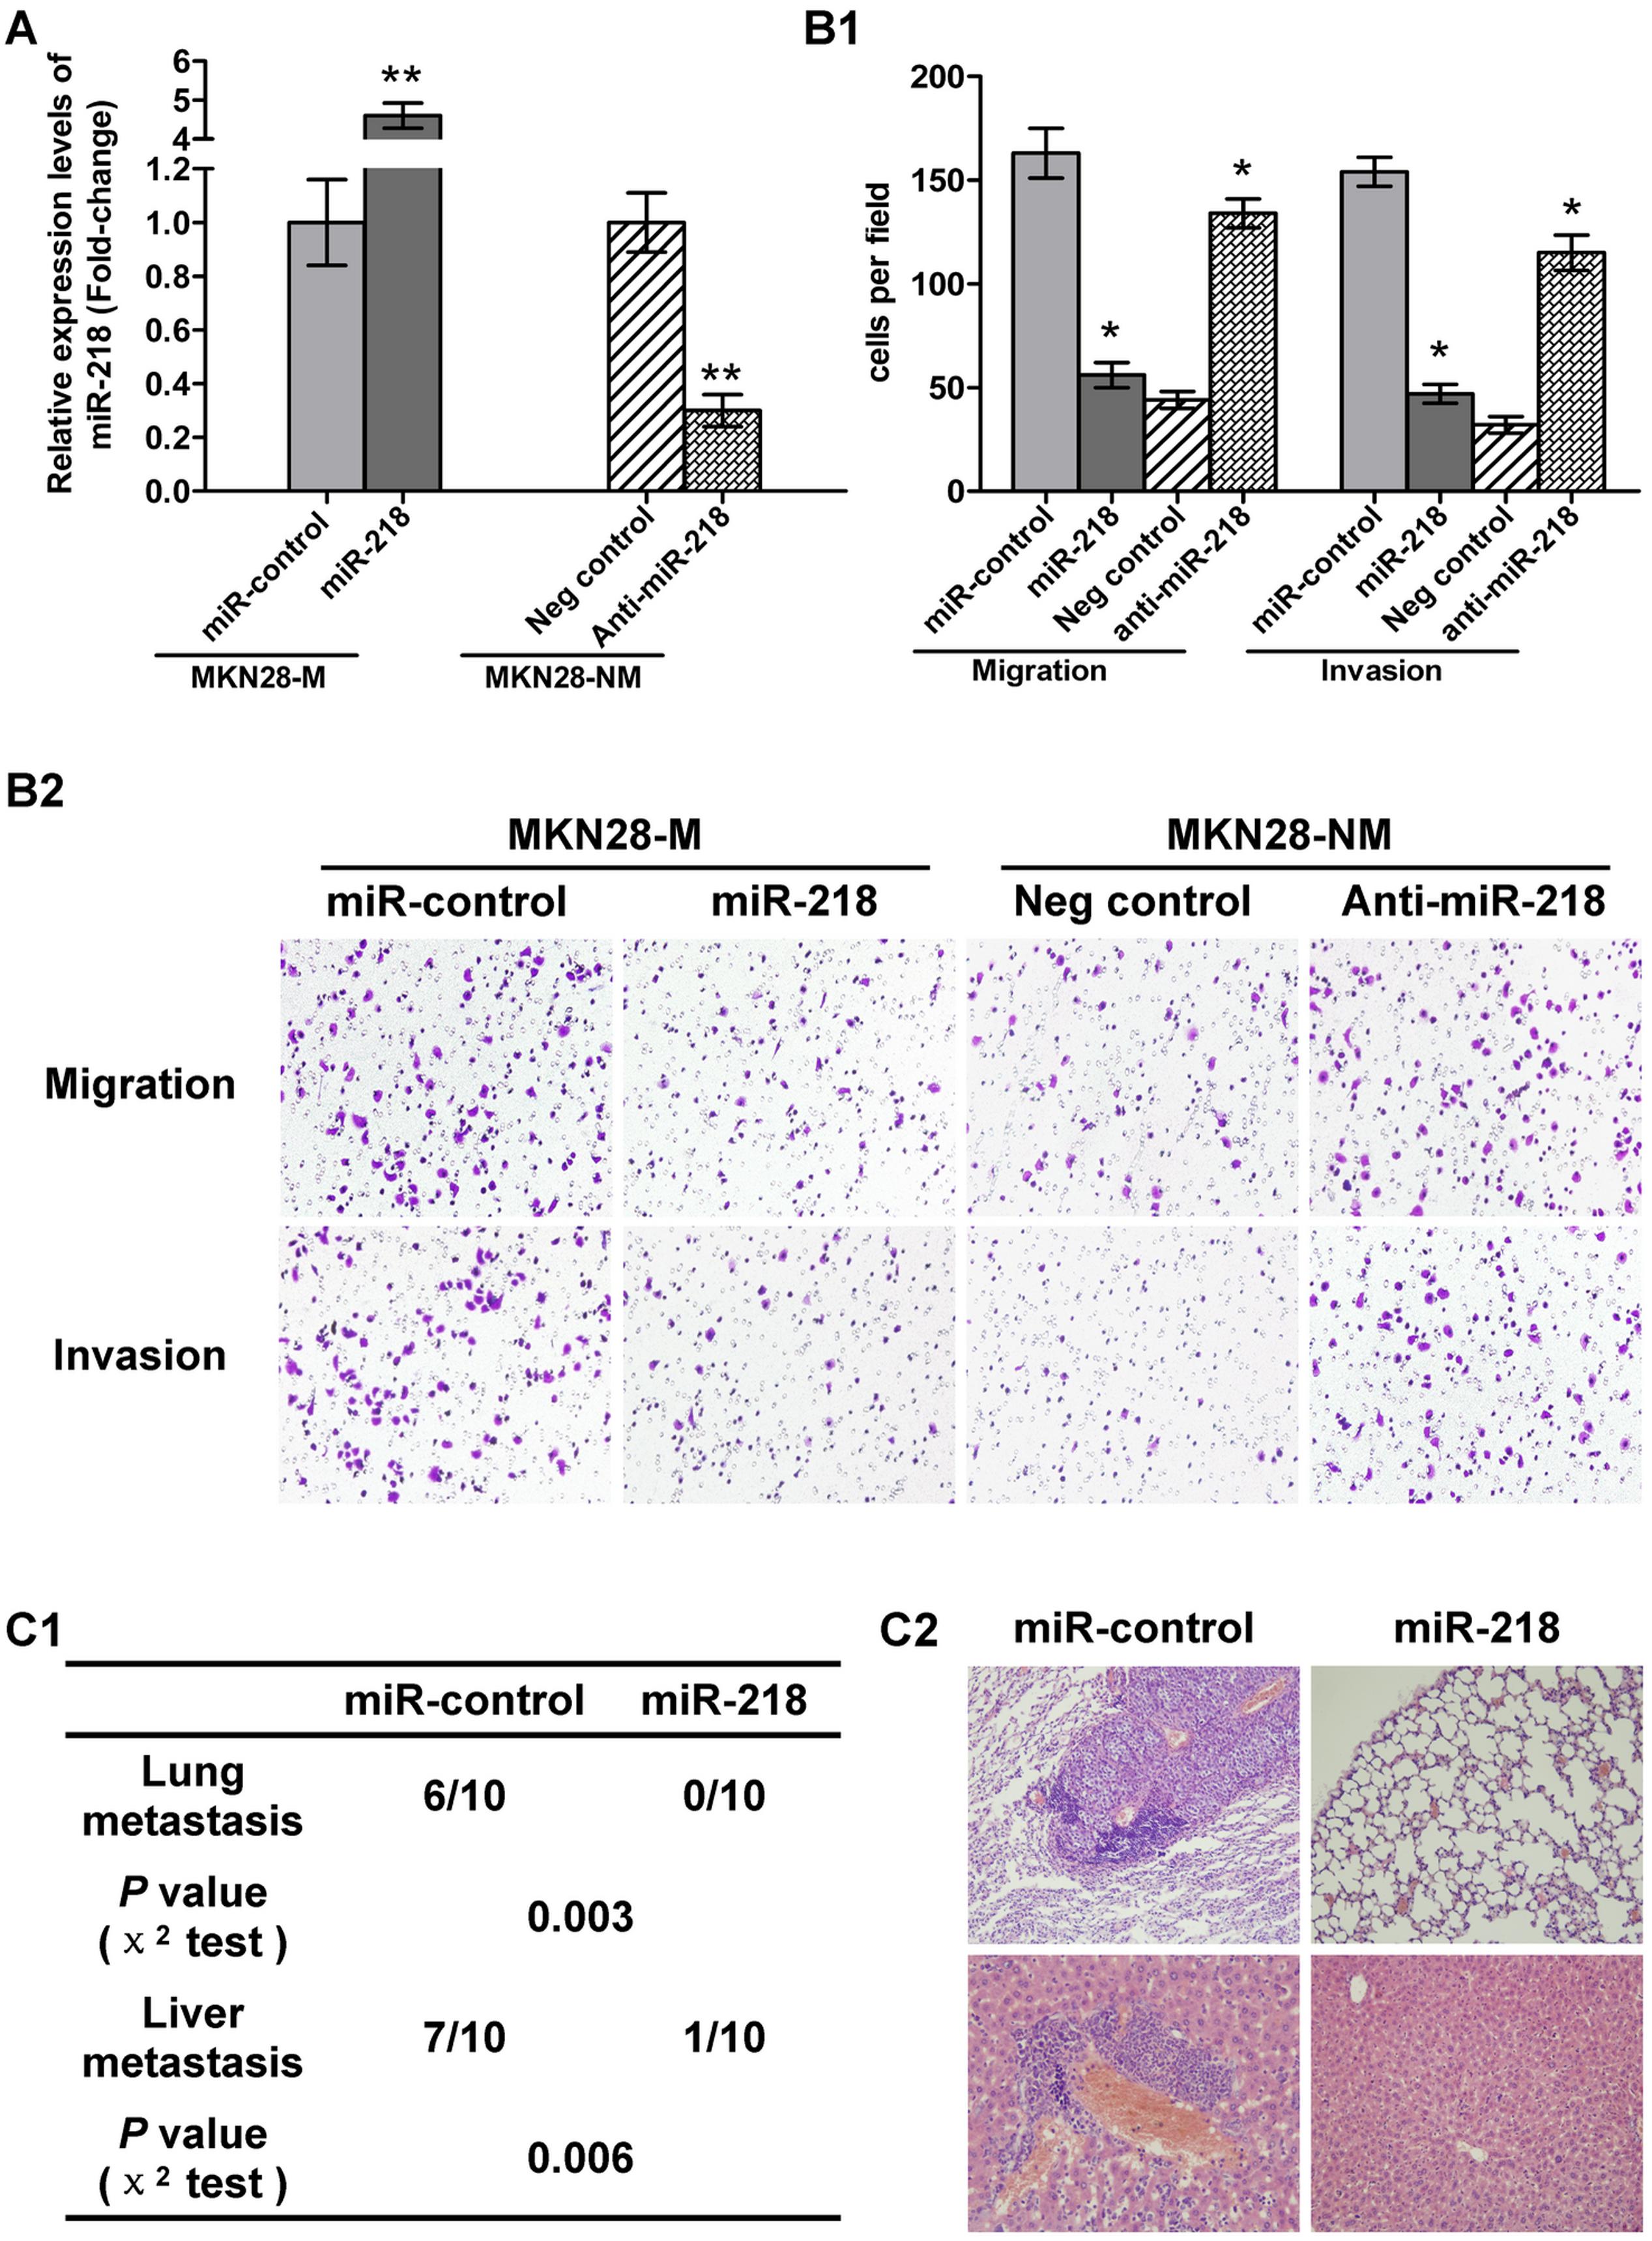 miR-218 suppressed tumor cell invasion and metastasis.